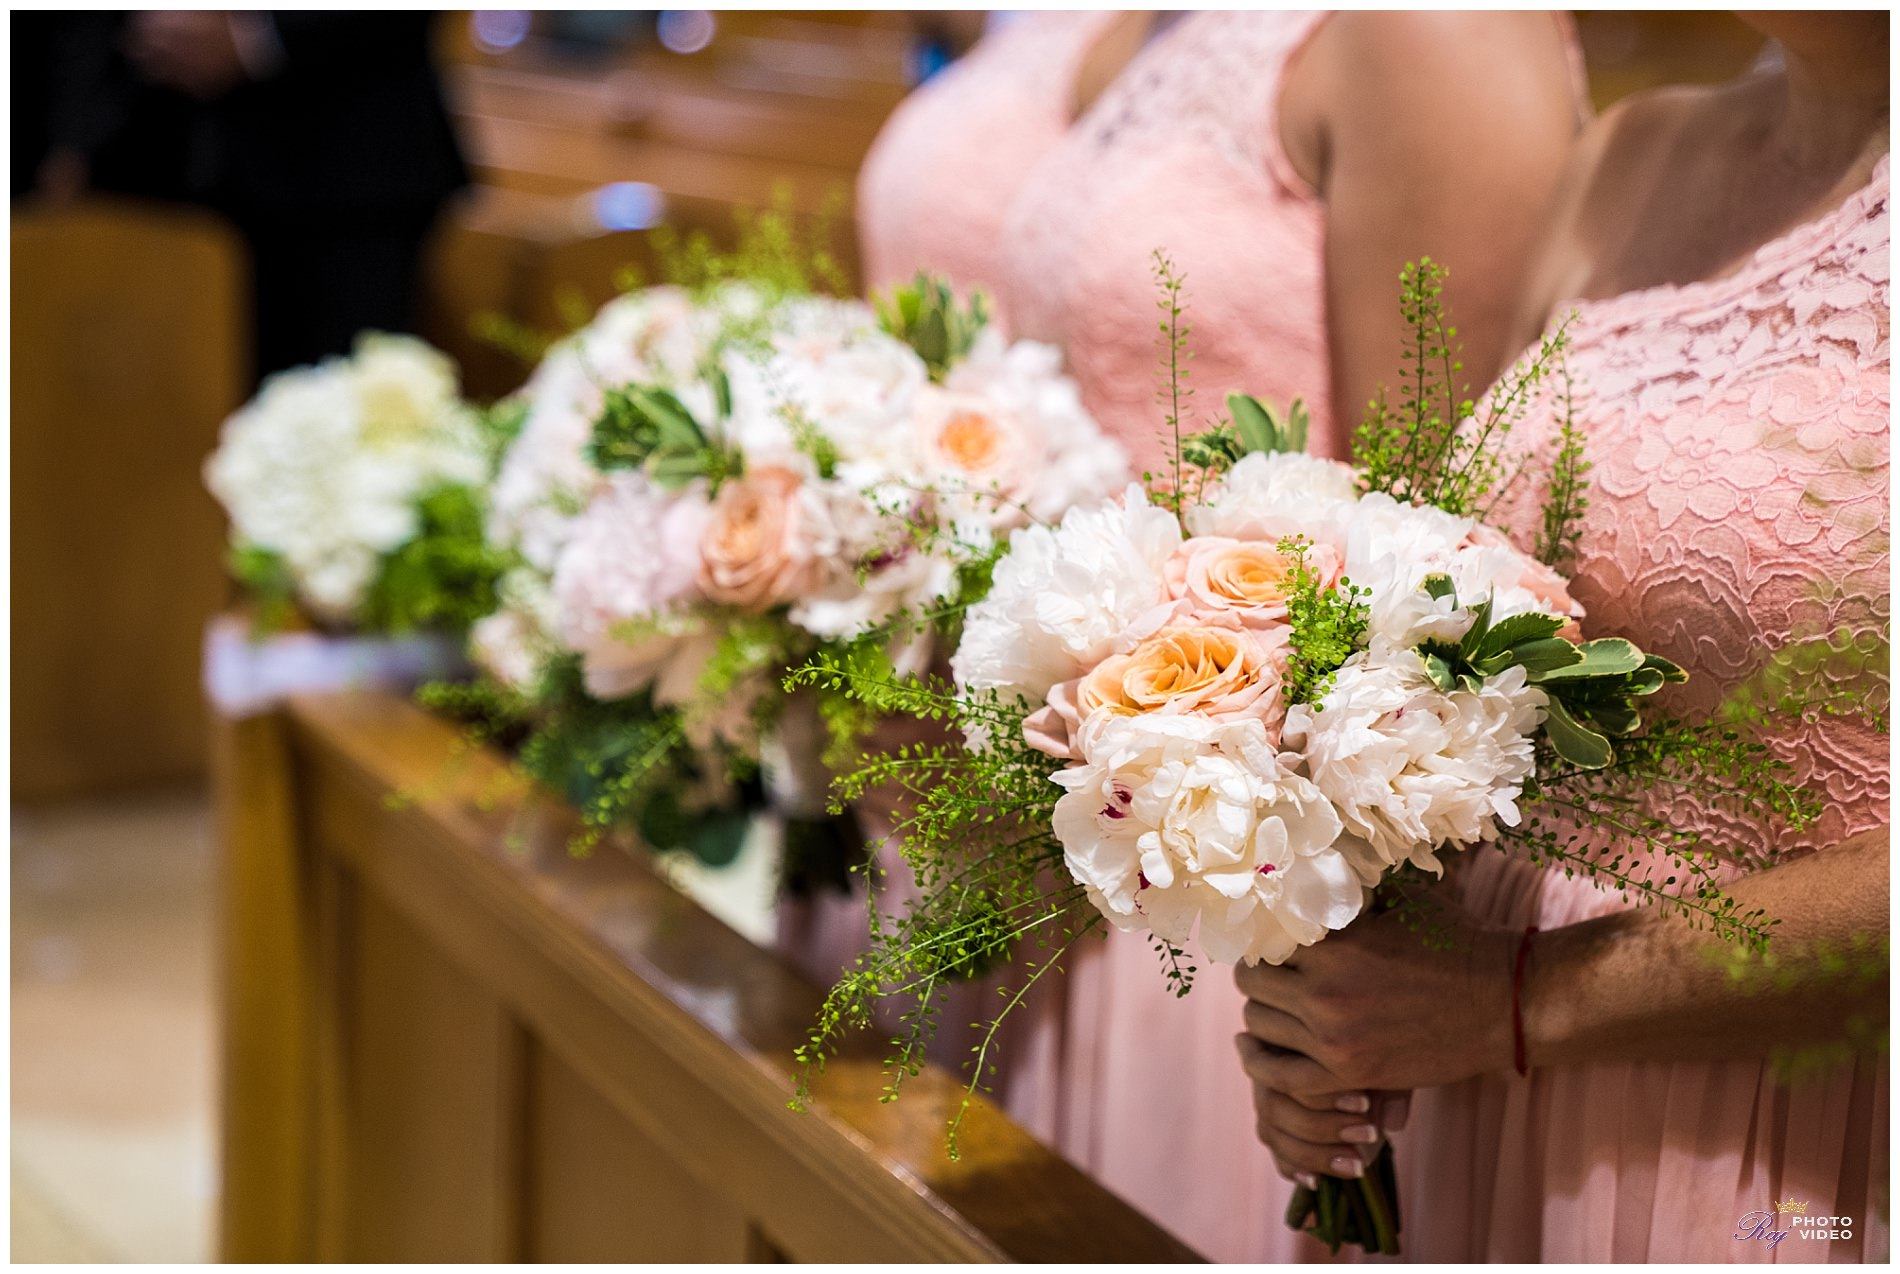 St-Valentines-Catholic-Church-Bloomfield-NJ-Wedding-Yanet-Jose-16.jpg